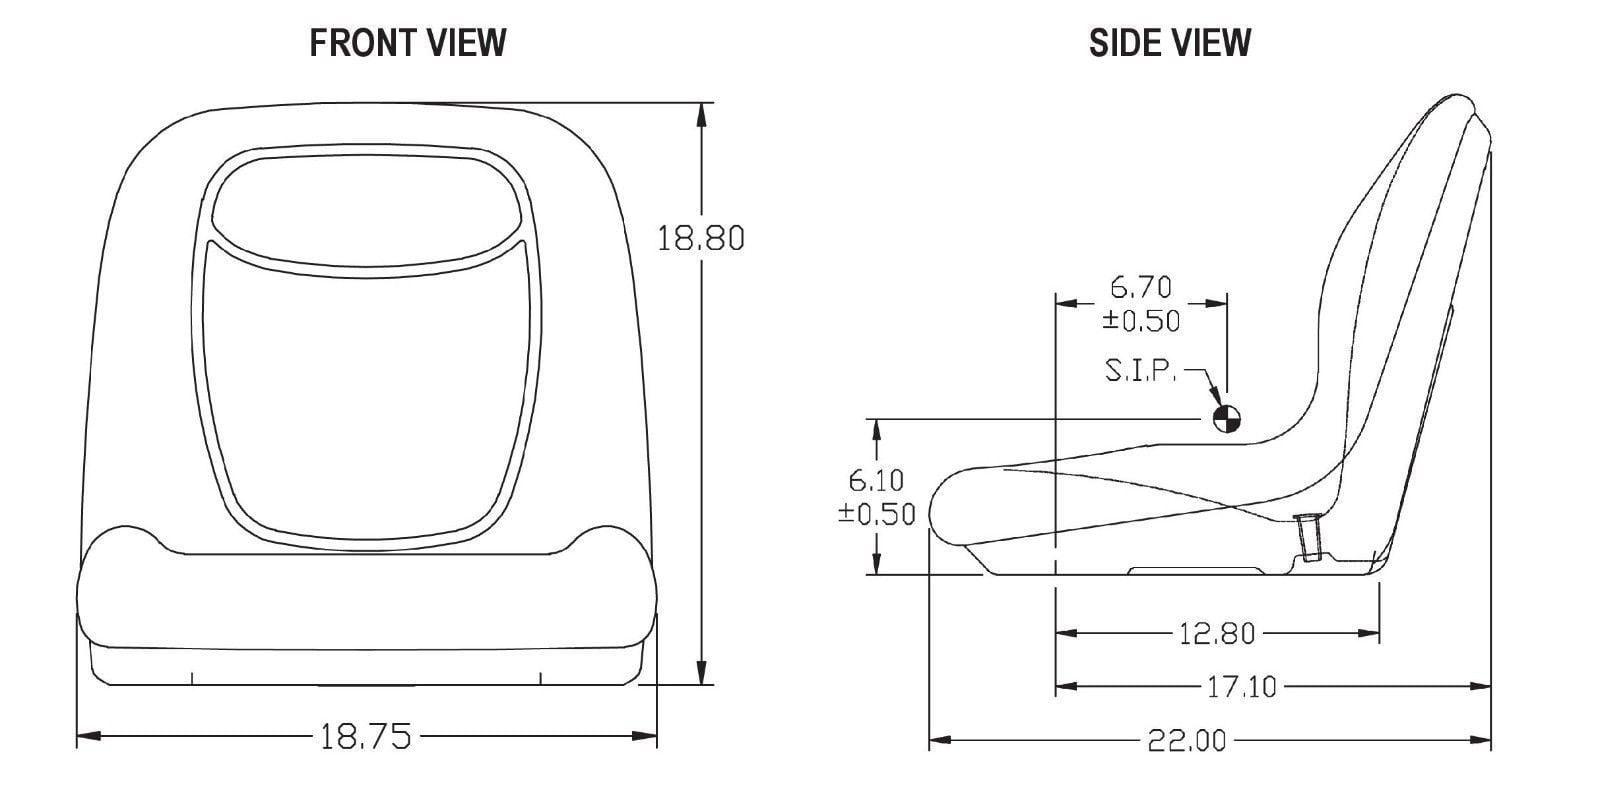 (2) HIGH BACK SEATS Toro Workman MD HD 2100 2300 4300 UTV